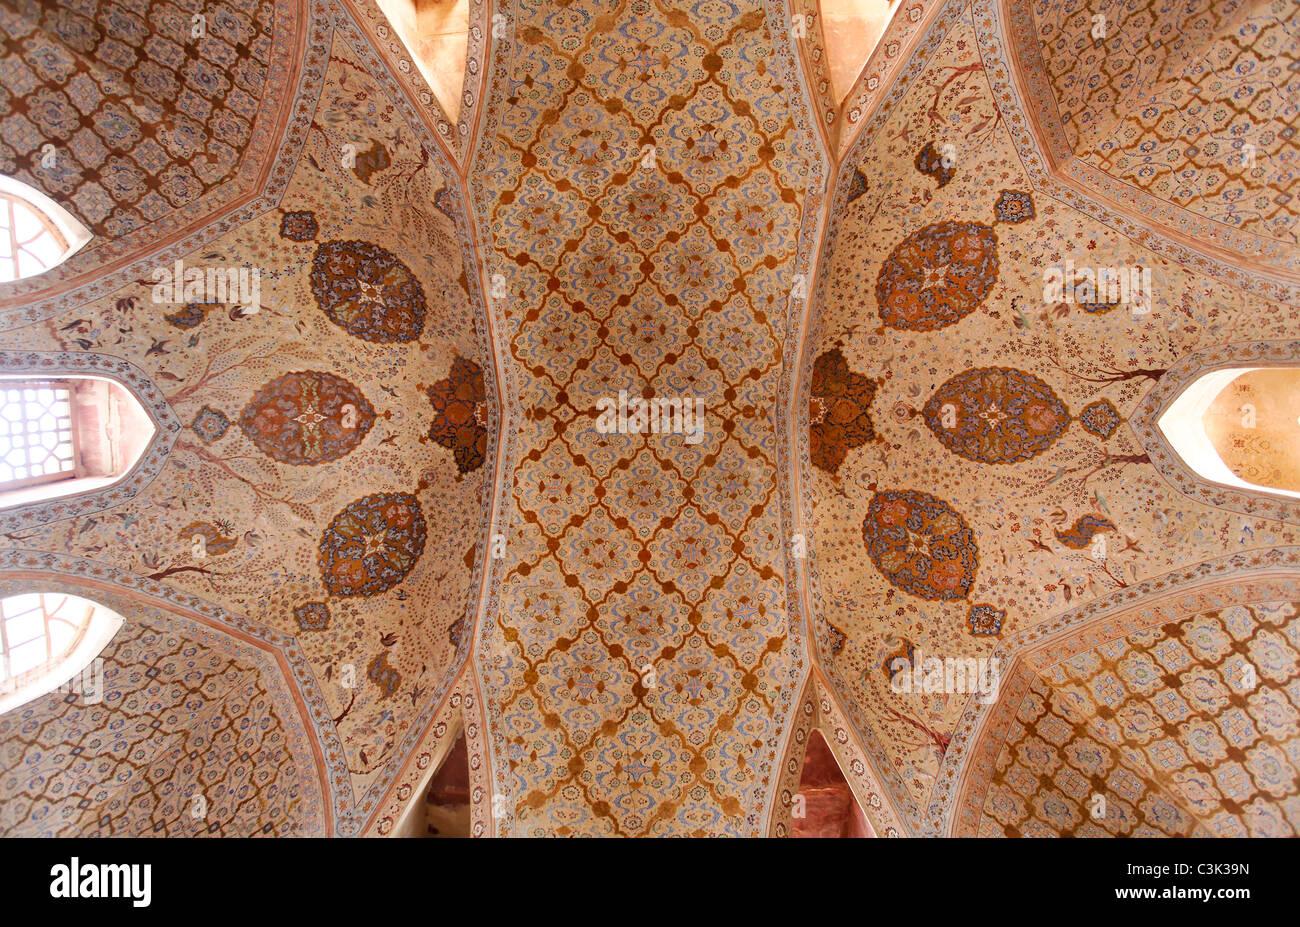 Ceiling inside the Ali Qapu palace, Isfahan, Iran Stock Photo